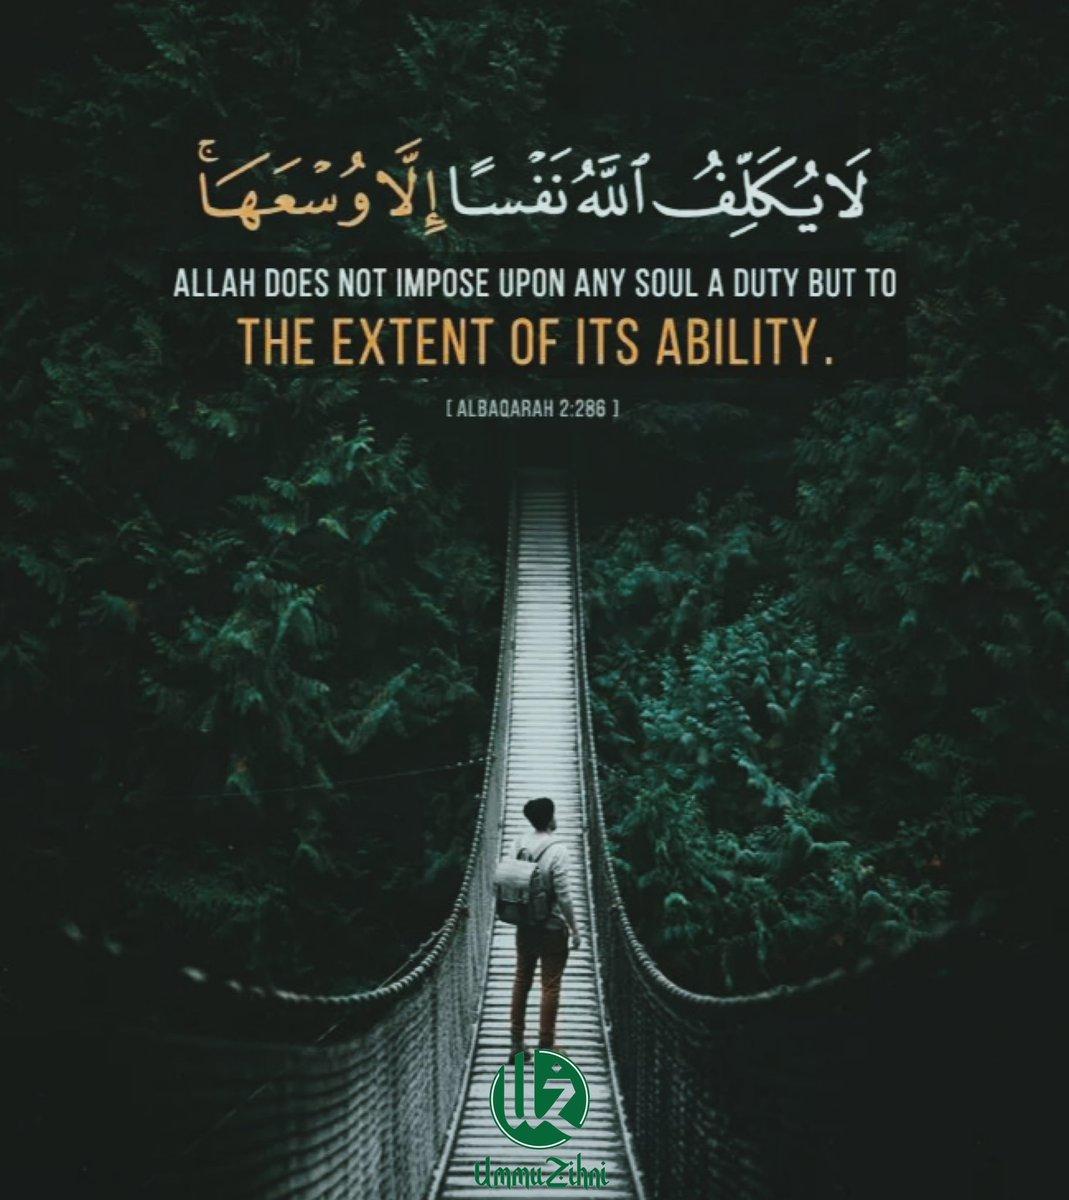 Terus meminta dan merayu pada Allah. Allah tahu kita mampu hadapinya. #jomngaji #tadabburquran #QuranHour #quranforall https://t.co/HU5a1ctkwH